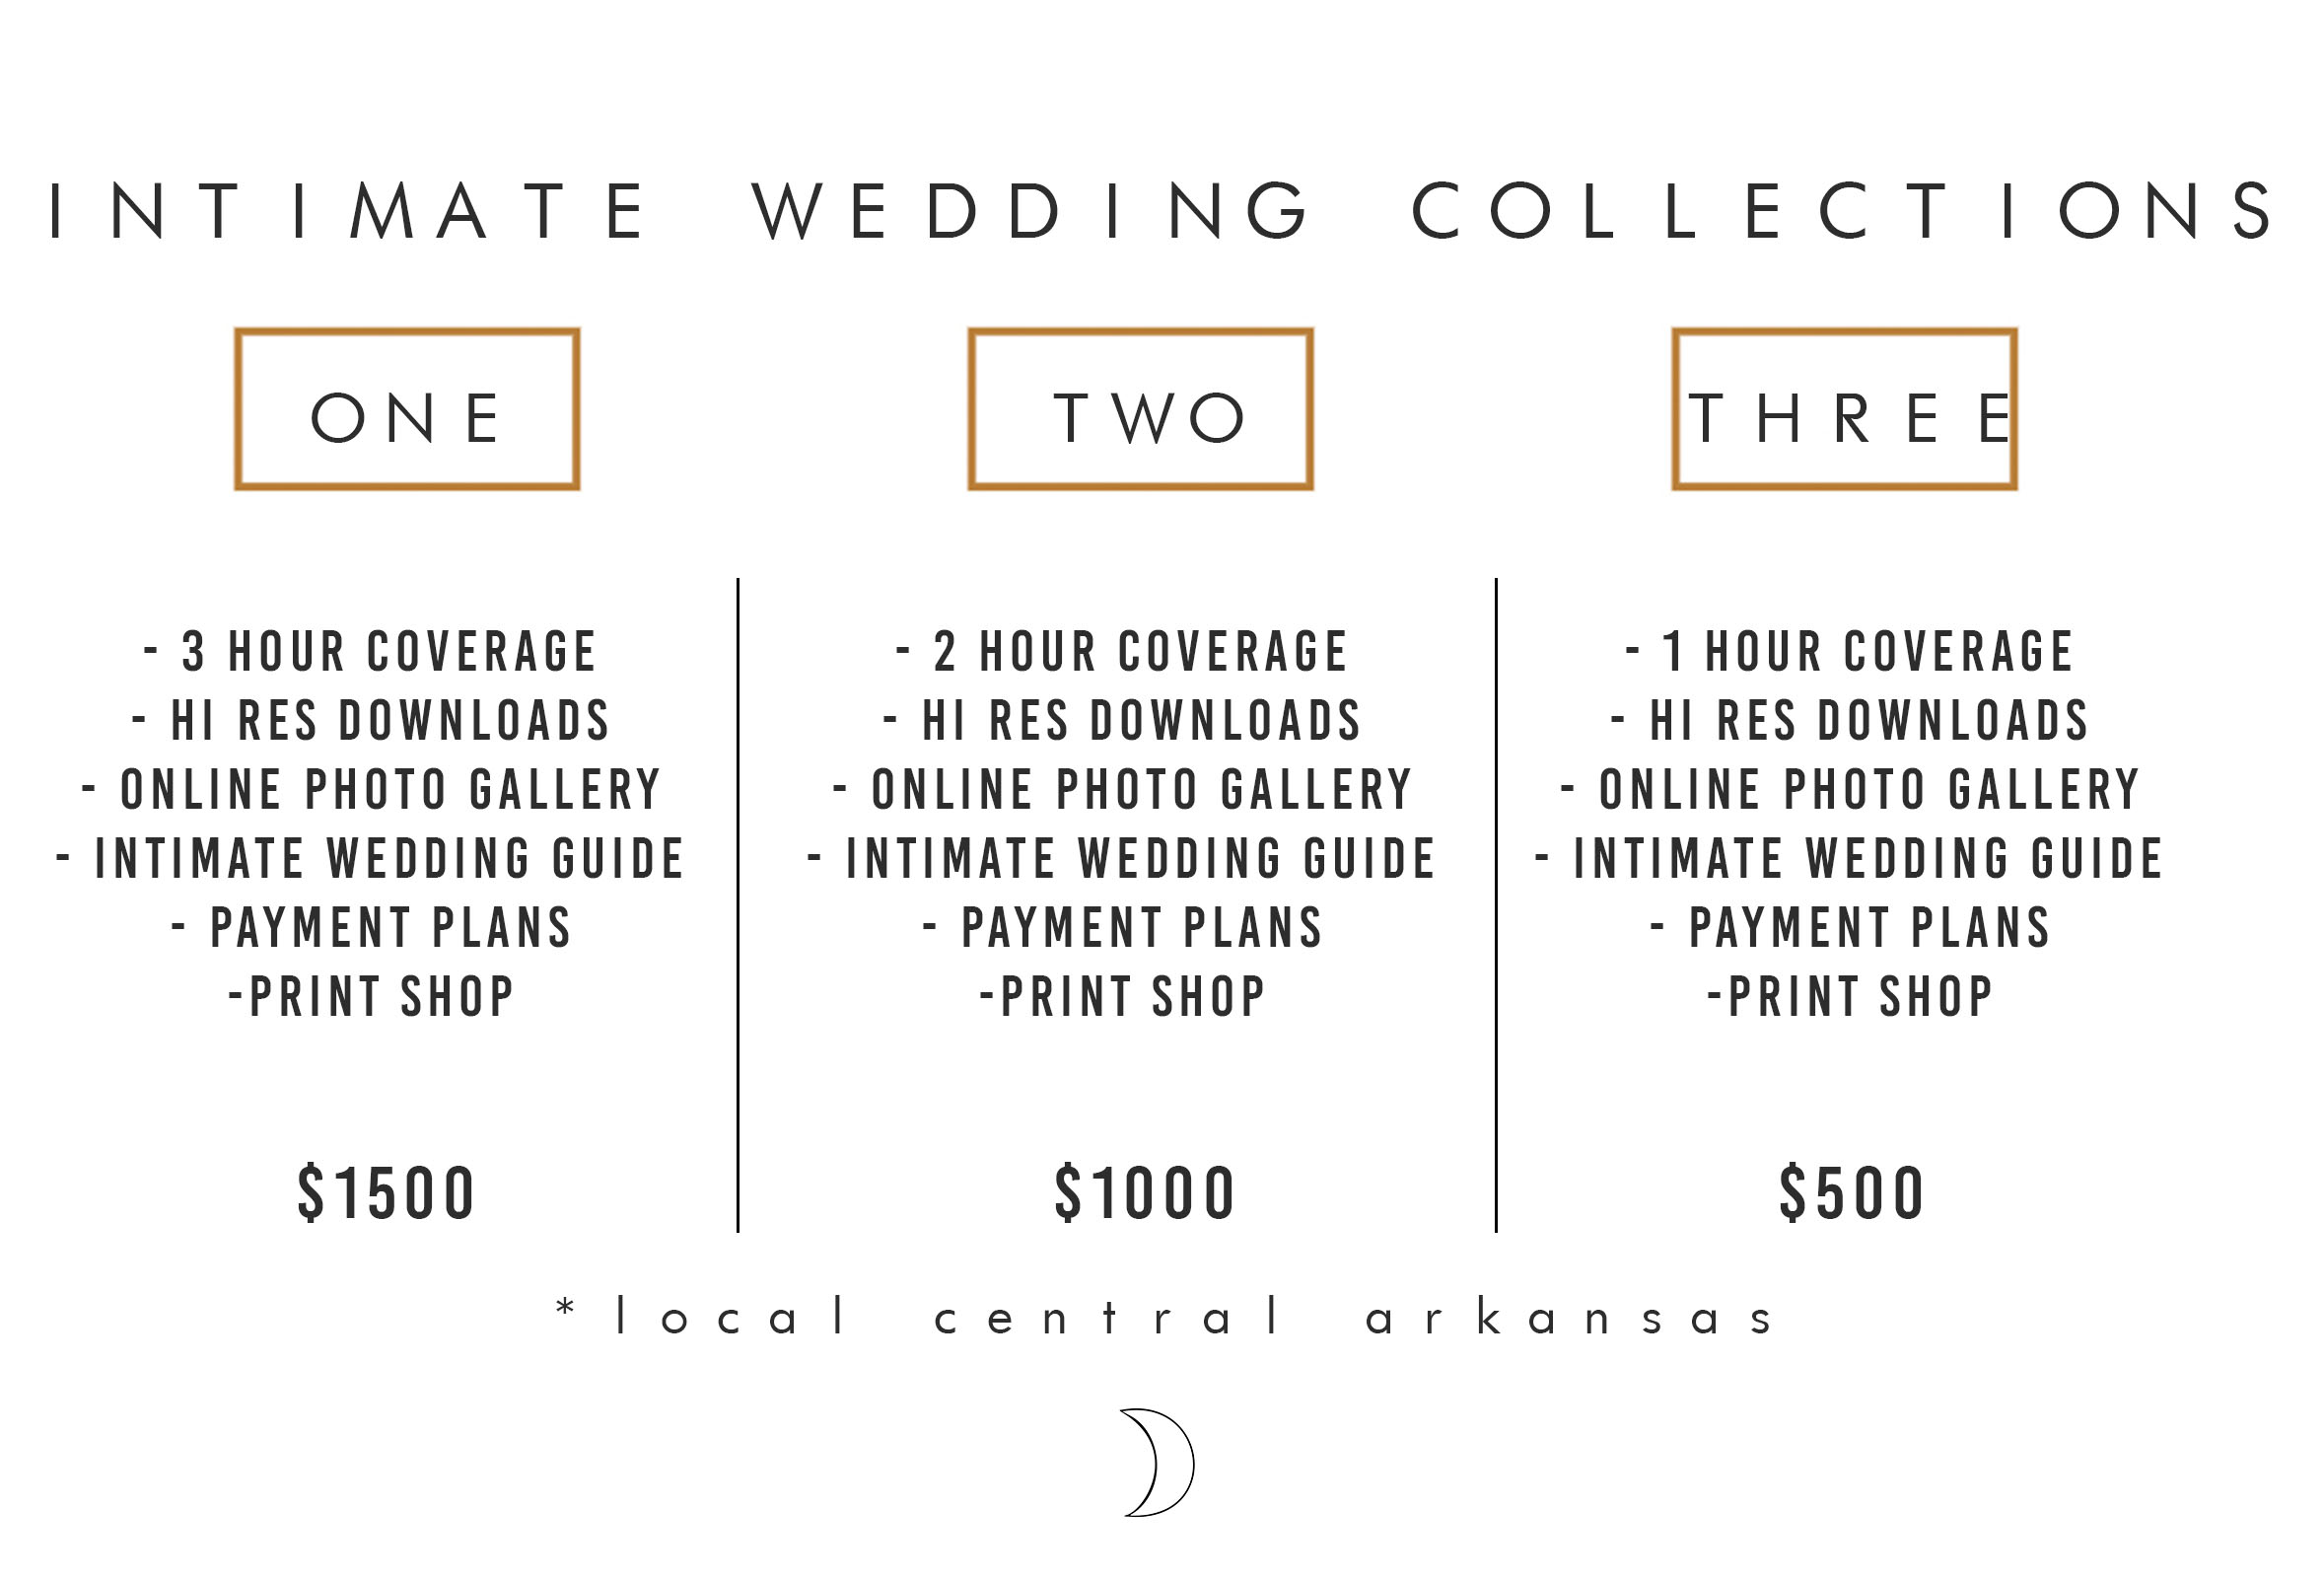 price-investment-INTIMATE-cost-elopement-engagement-intimate-wedding-love-little-rock-arkansas-photographer-erin-venable-photography-bride-groom-palm-springs-california-dessert